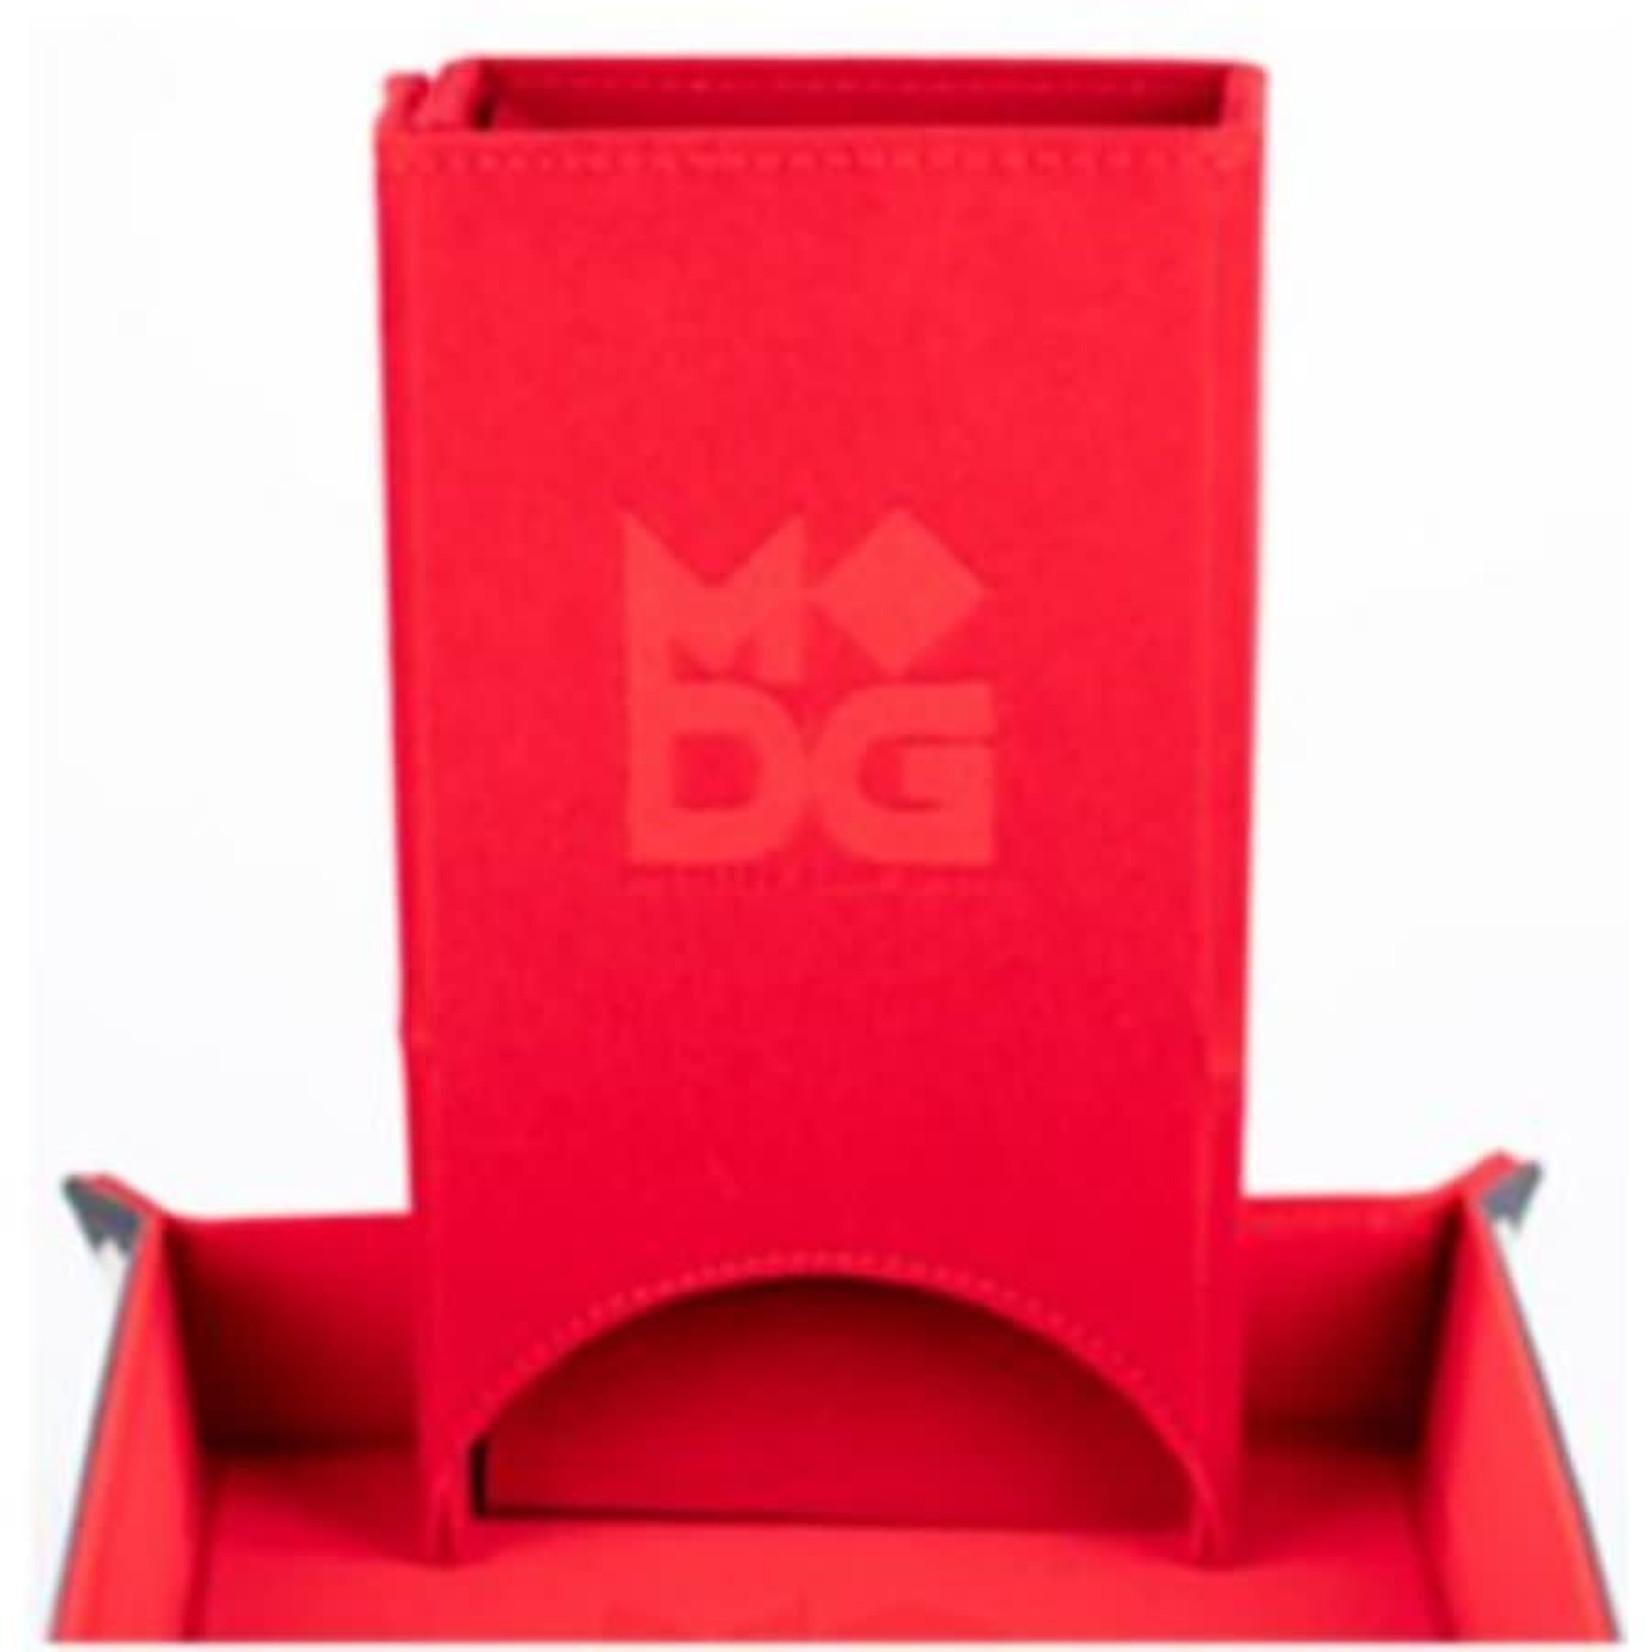 Metallic Dice Games Metallic Dice Games Velvet Dice Tower: Red